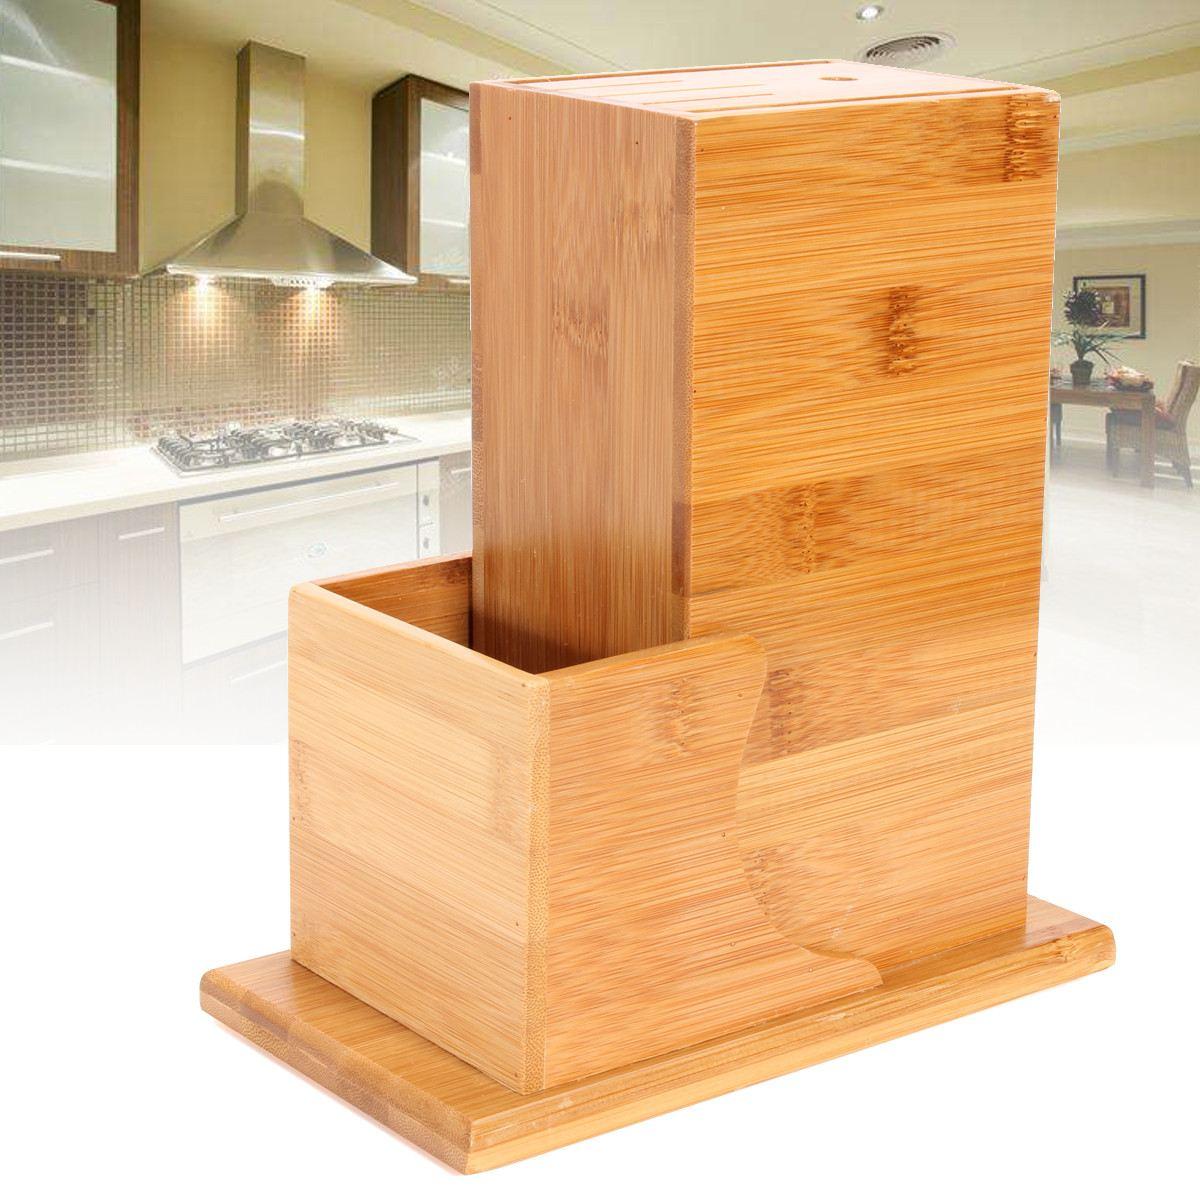 Bamboo Wood Knife Block Holder Wooden Kitchen Knife Stand Cutter Storage Rack Kitchenware Organizer Multipurpose Storage Tool